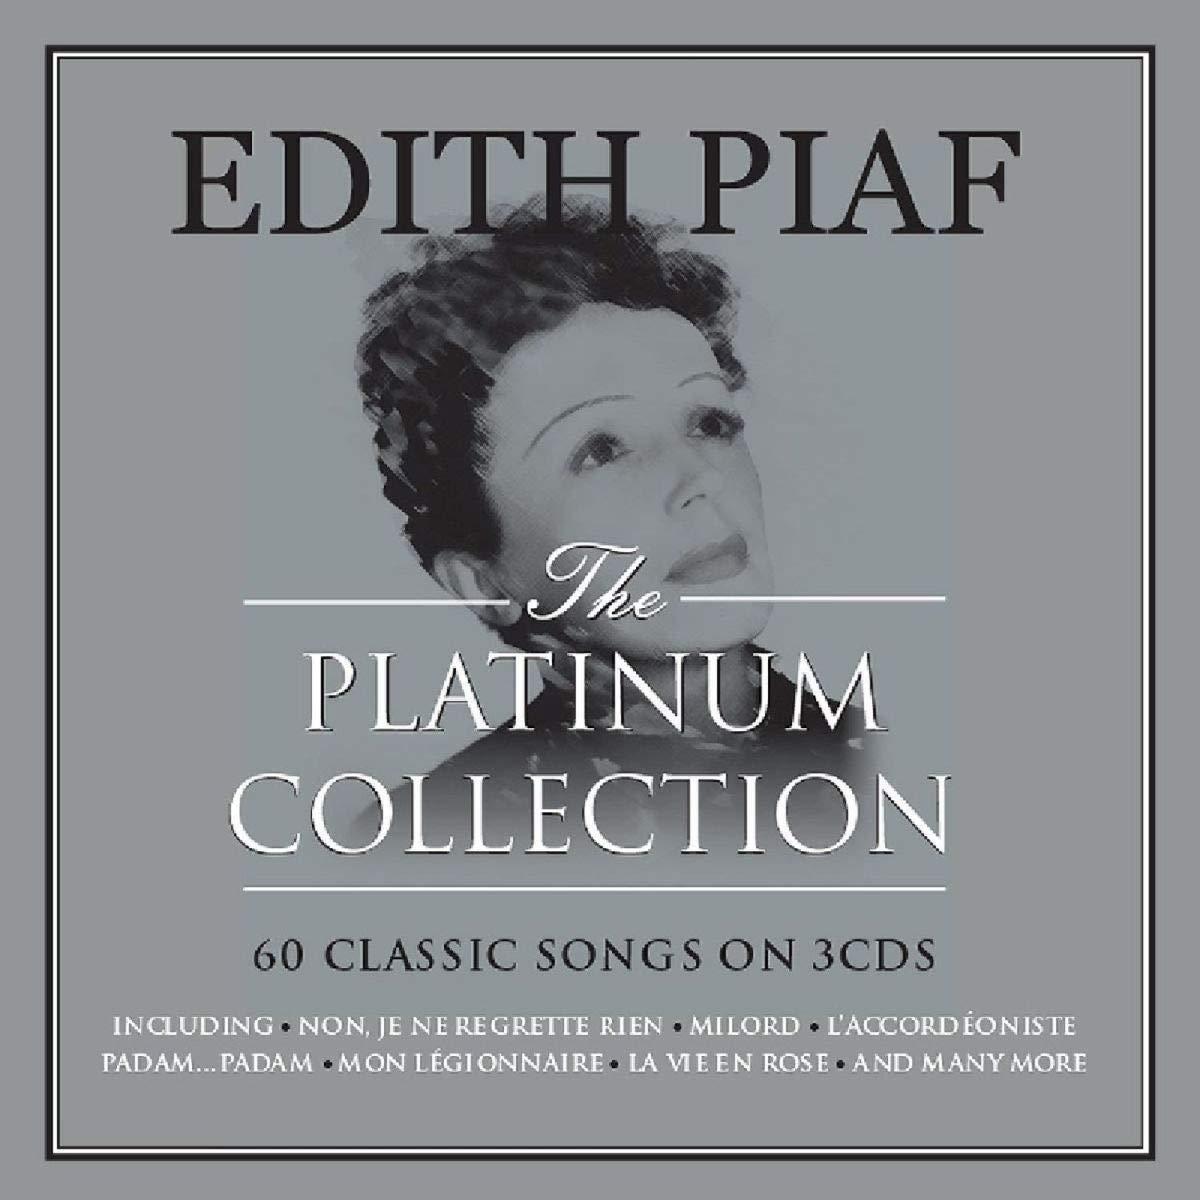 Platinum Collection - Edith Piaf